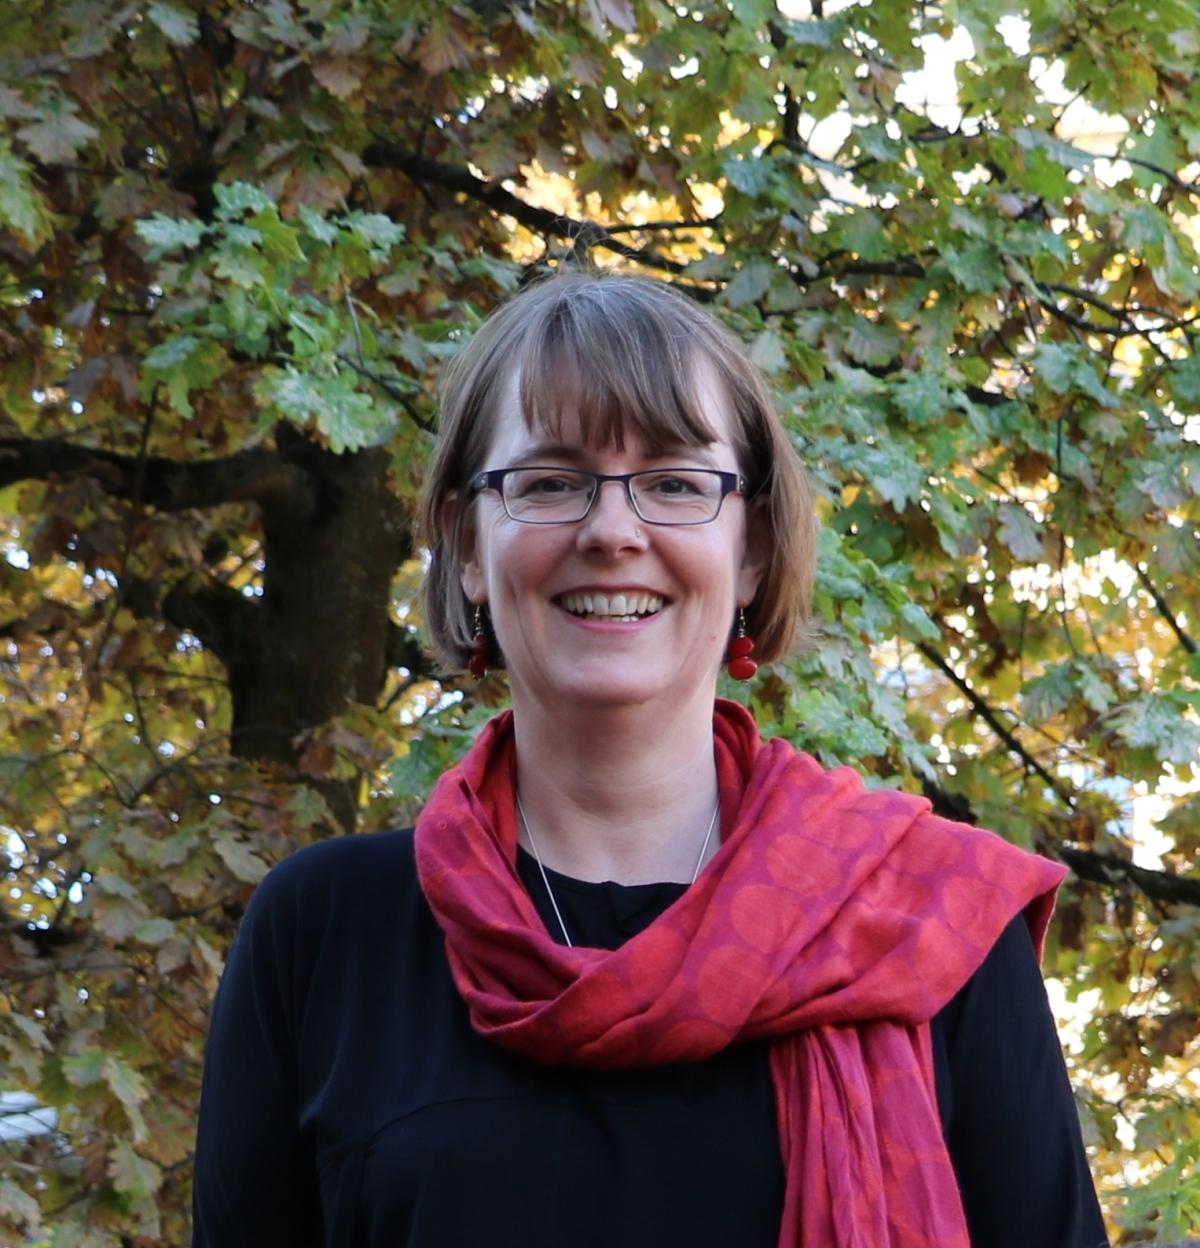 RWSN's Kerstin Danert wins topaward